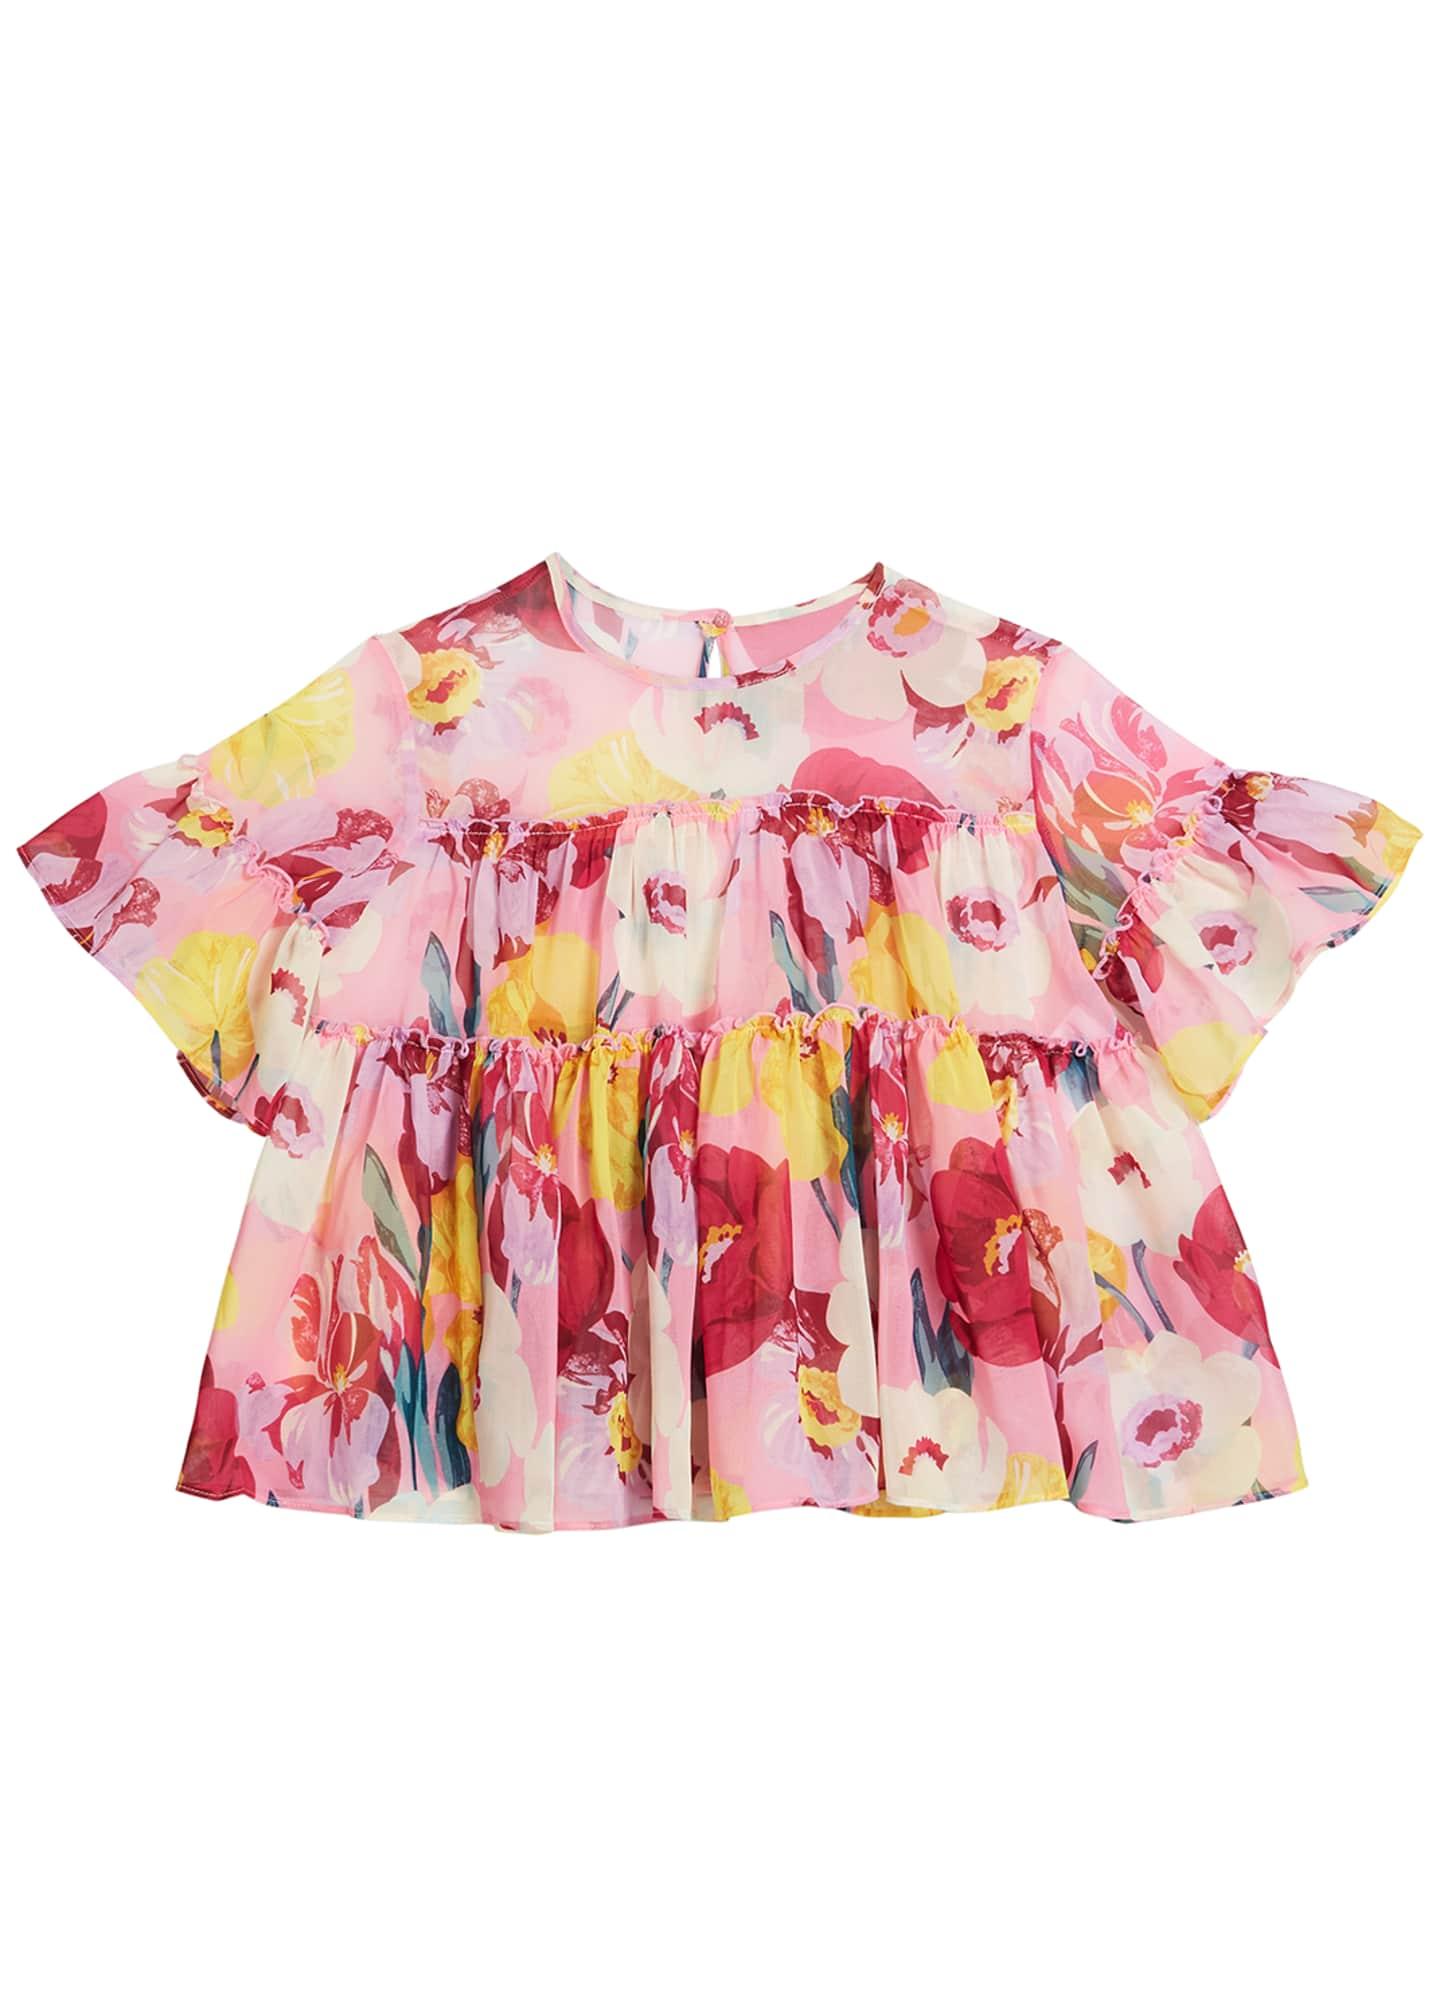 Mayoral Floral Print Chiffon Blouse, Size 8-16